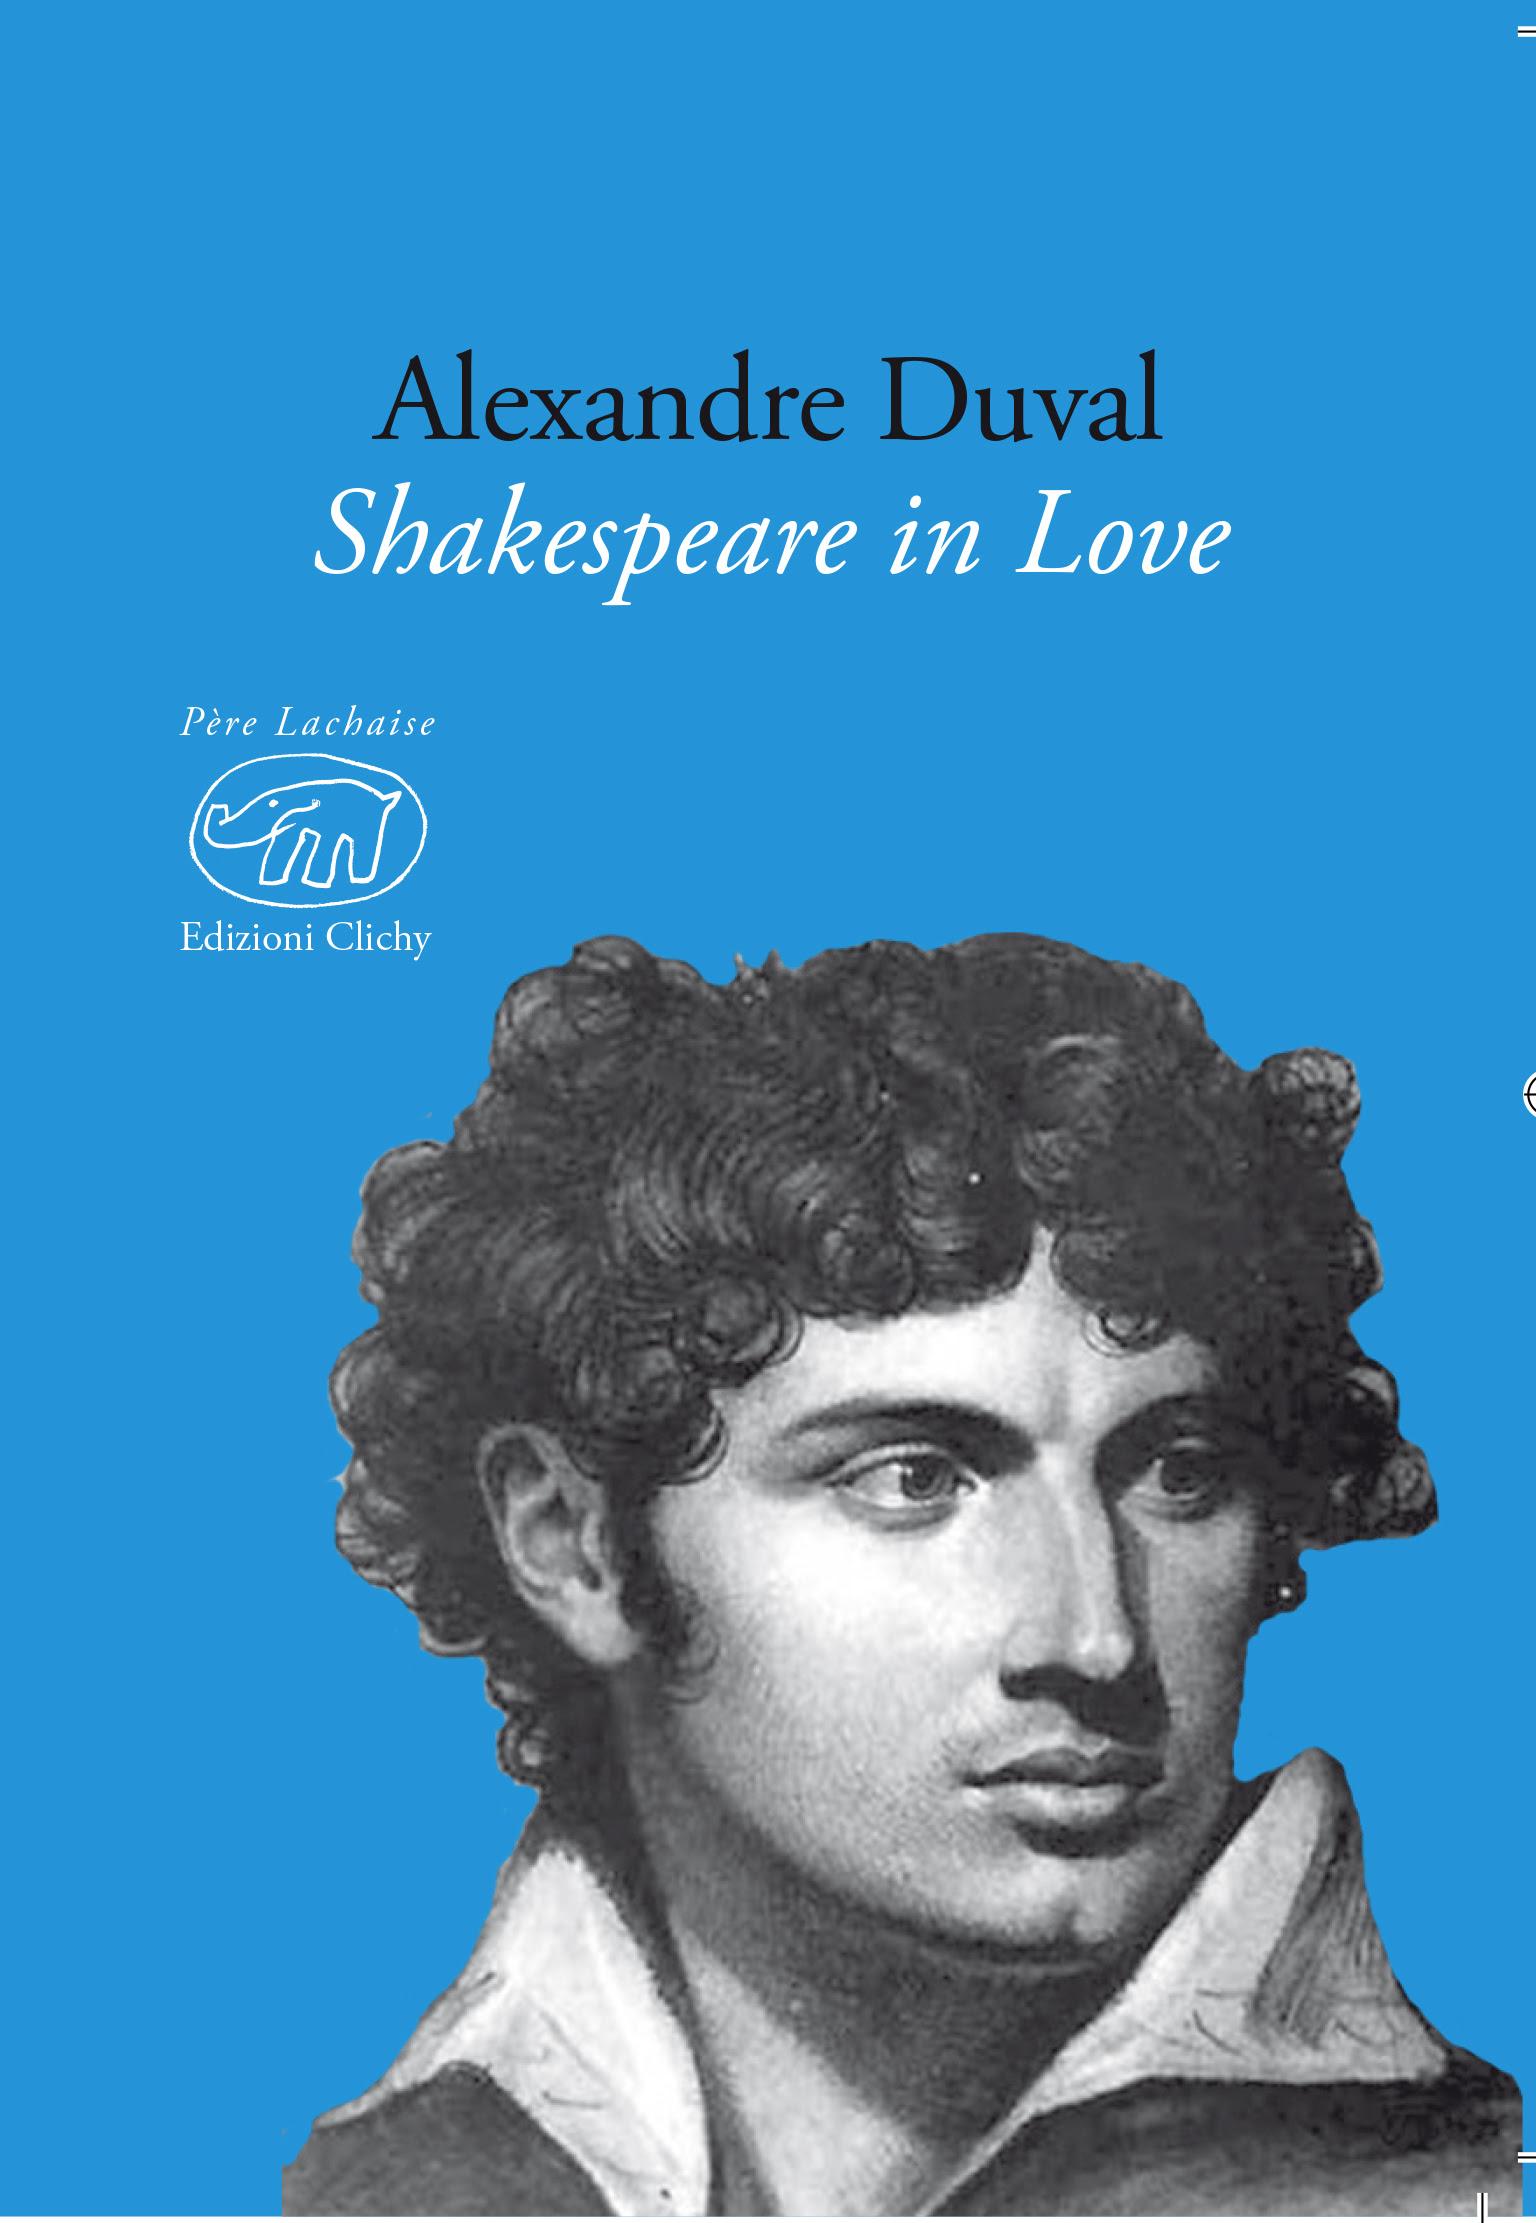 shakespeare-in-love-di-alexandre-duval